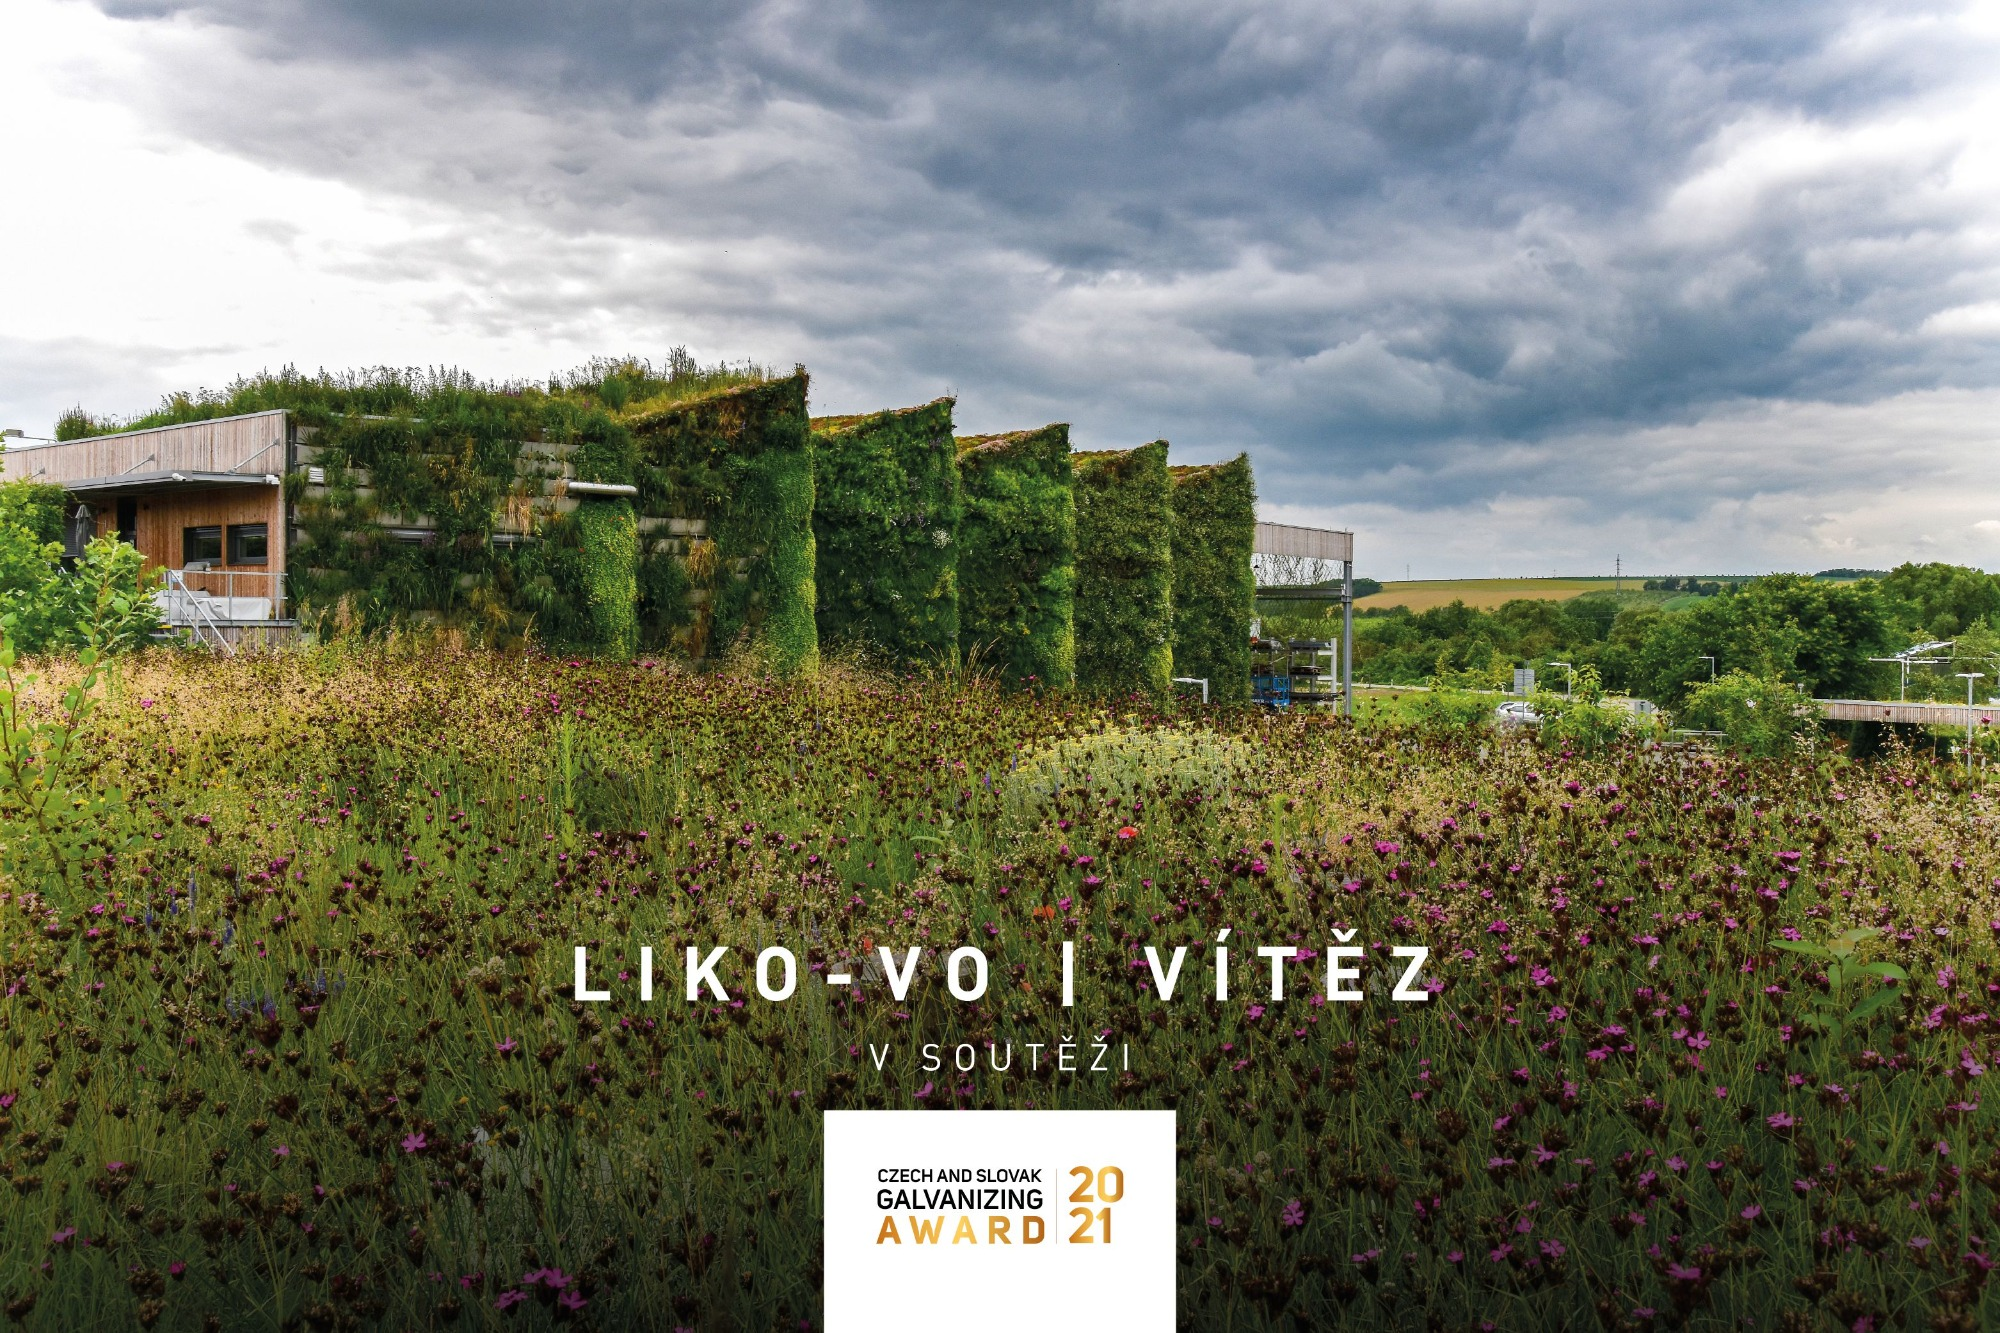 Living hall LIKO-Vo won the Czech and Slovak Galvanizing Award 2021